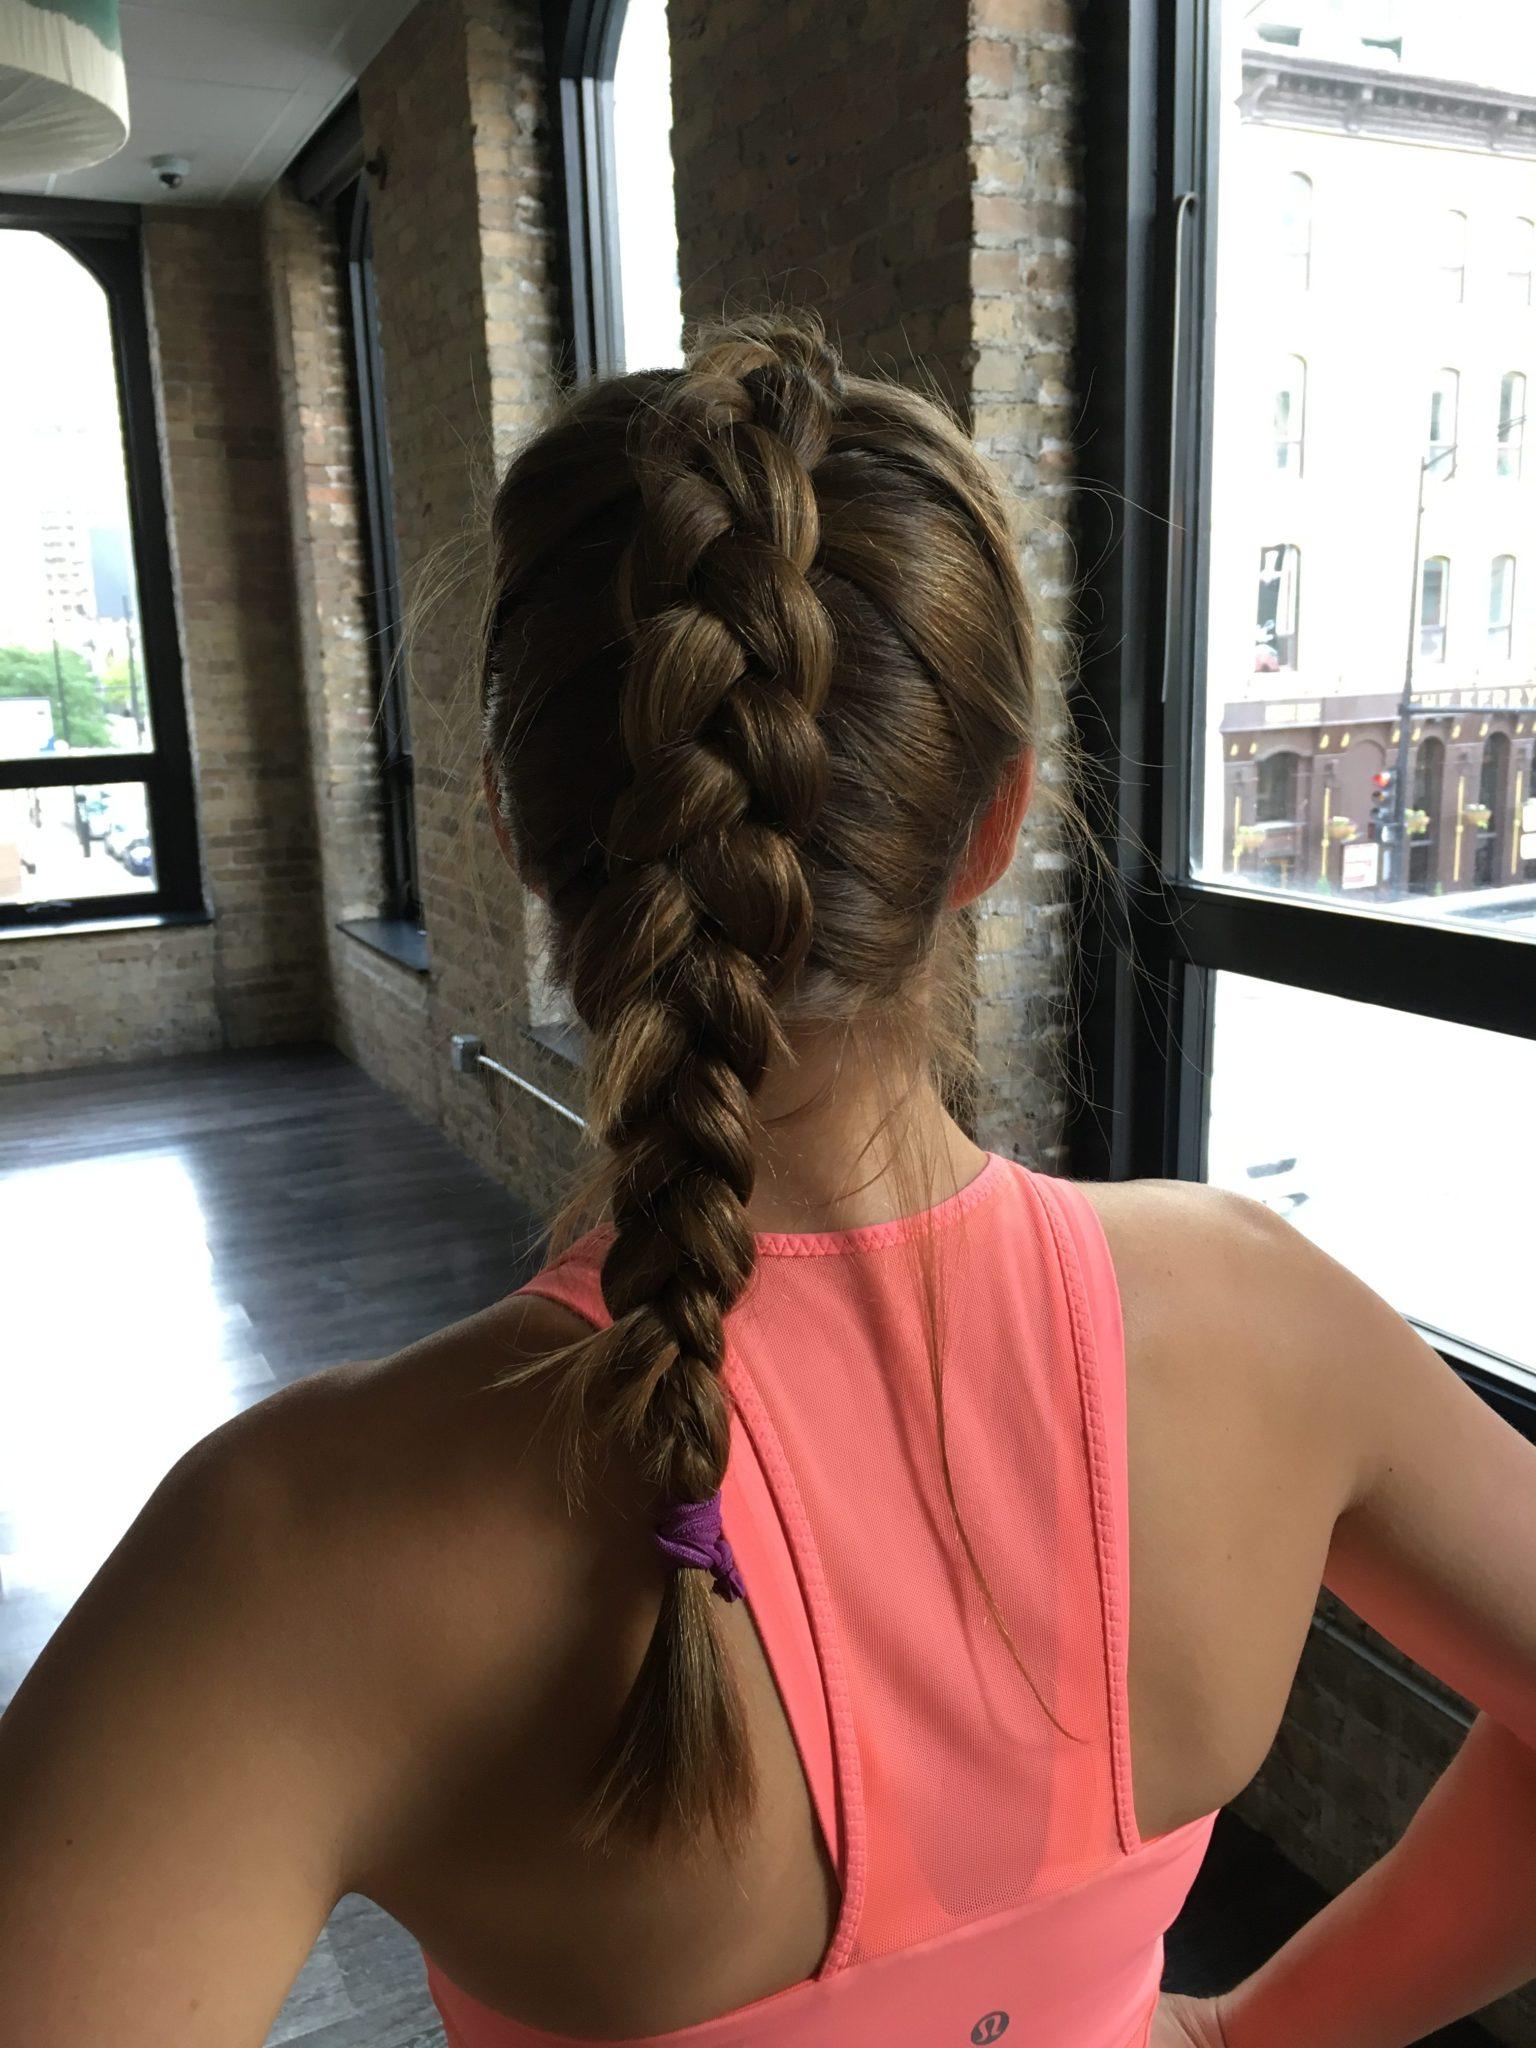 asweatlife_Studio to street hair 2